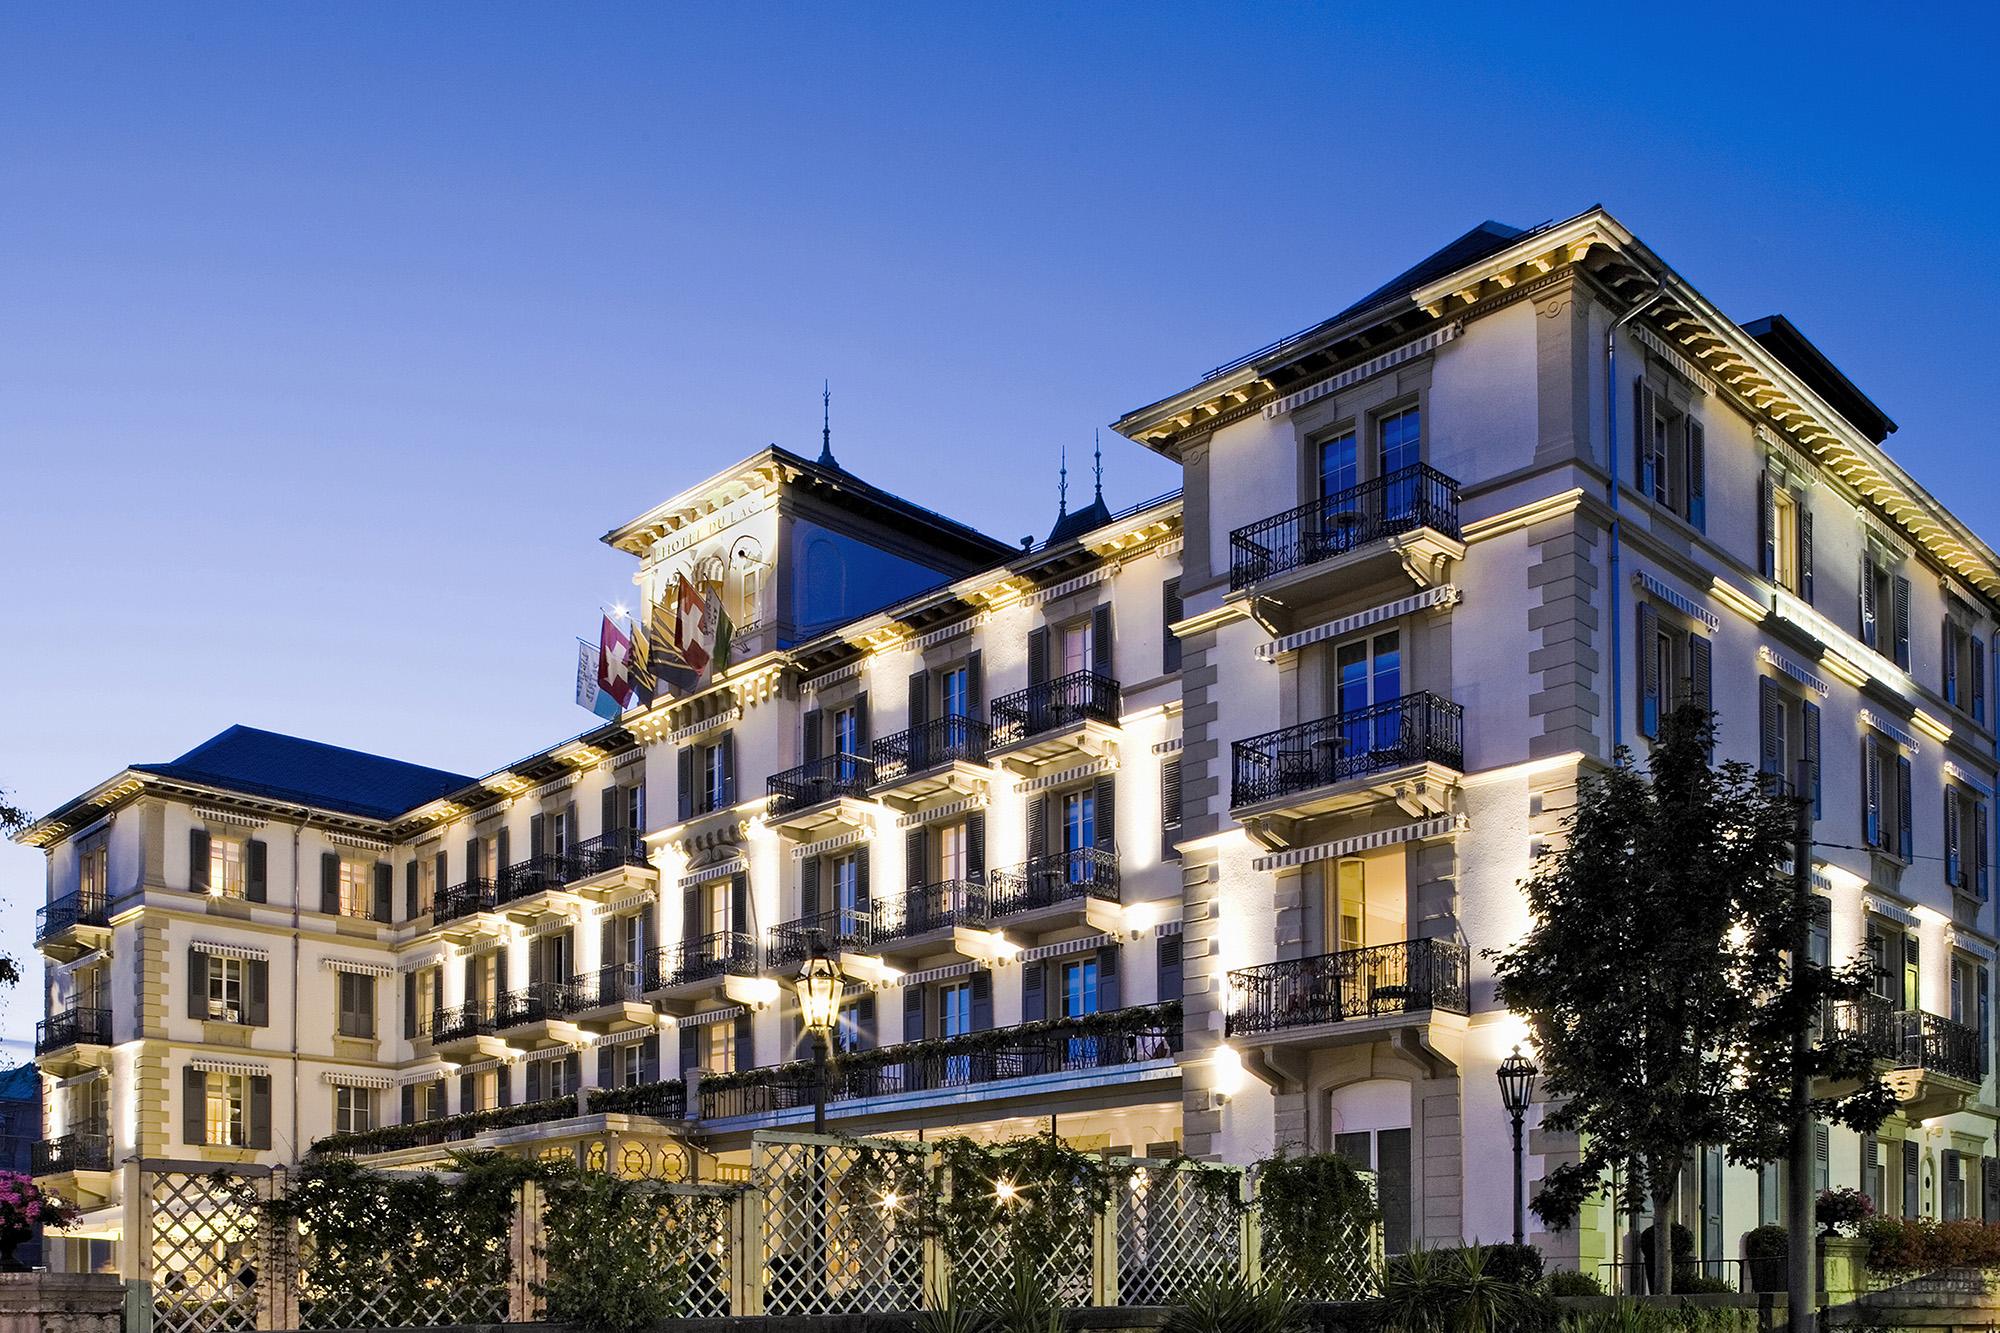 grand_hotel_du_lac copy.jpg